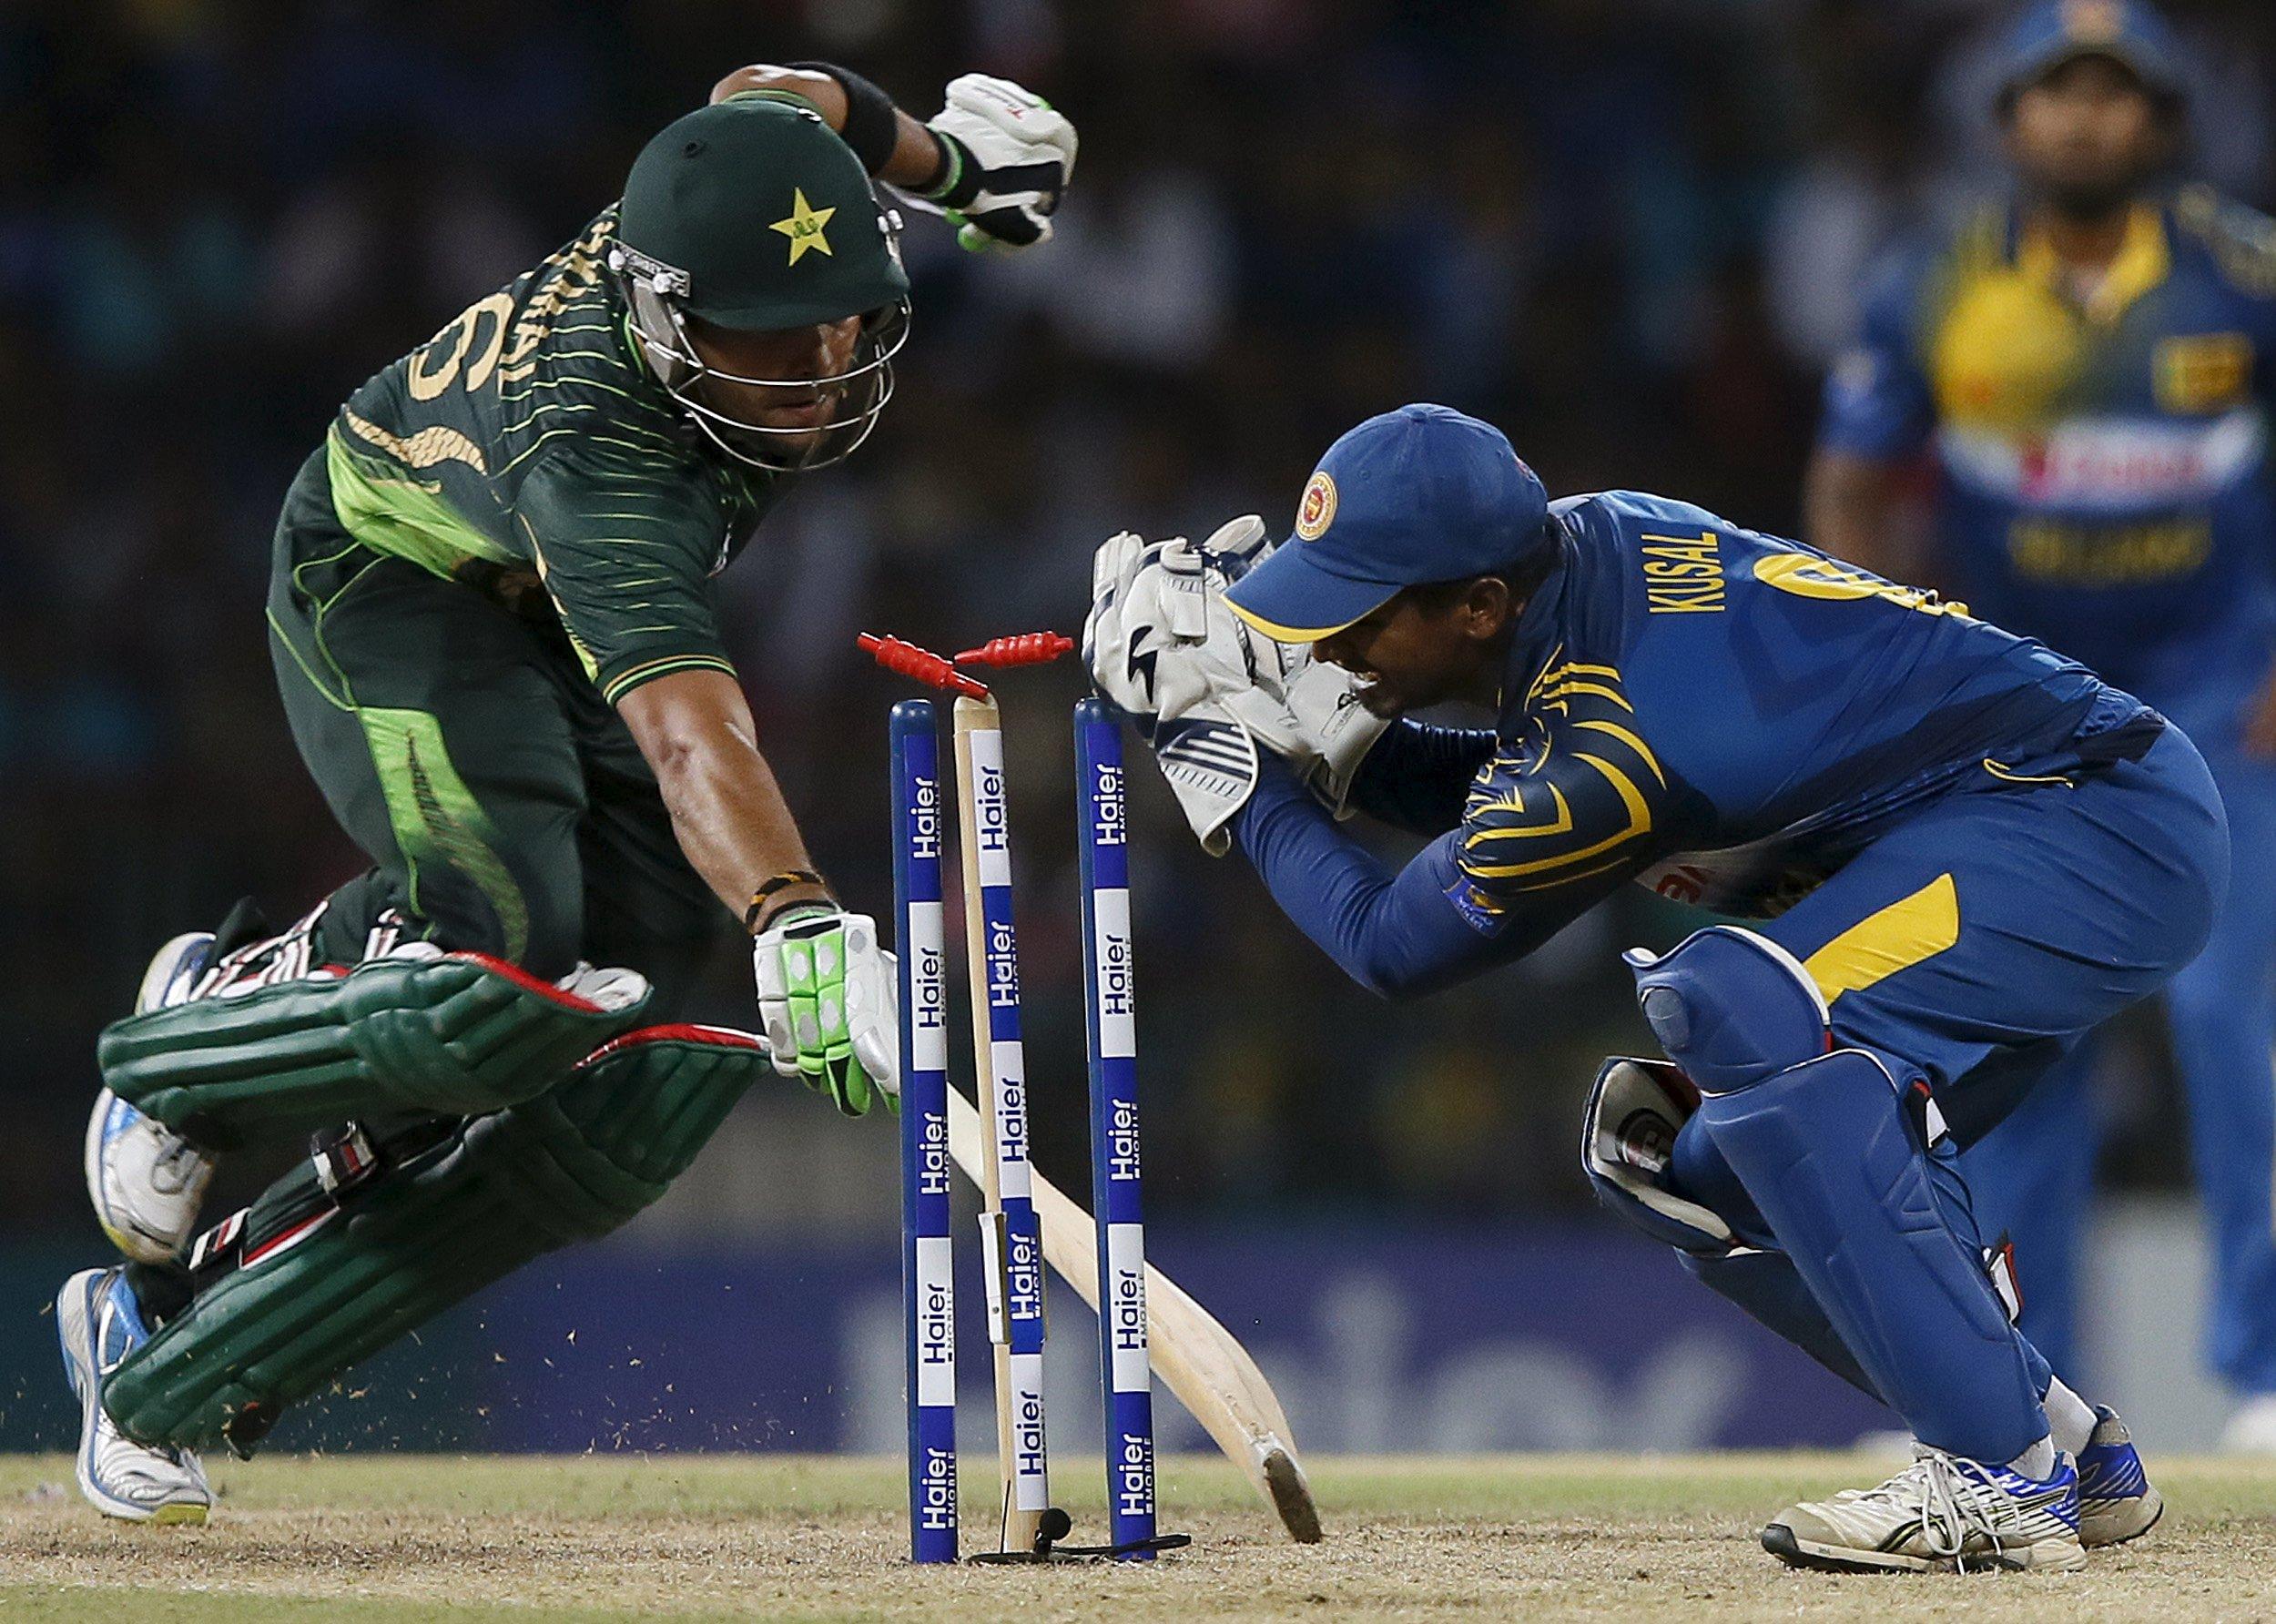 Sri Lanka's wicketkeeper Kusal Perera